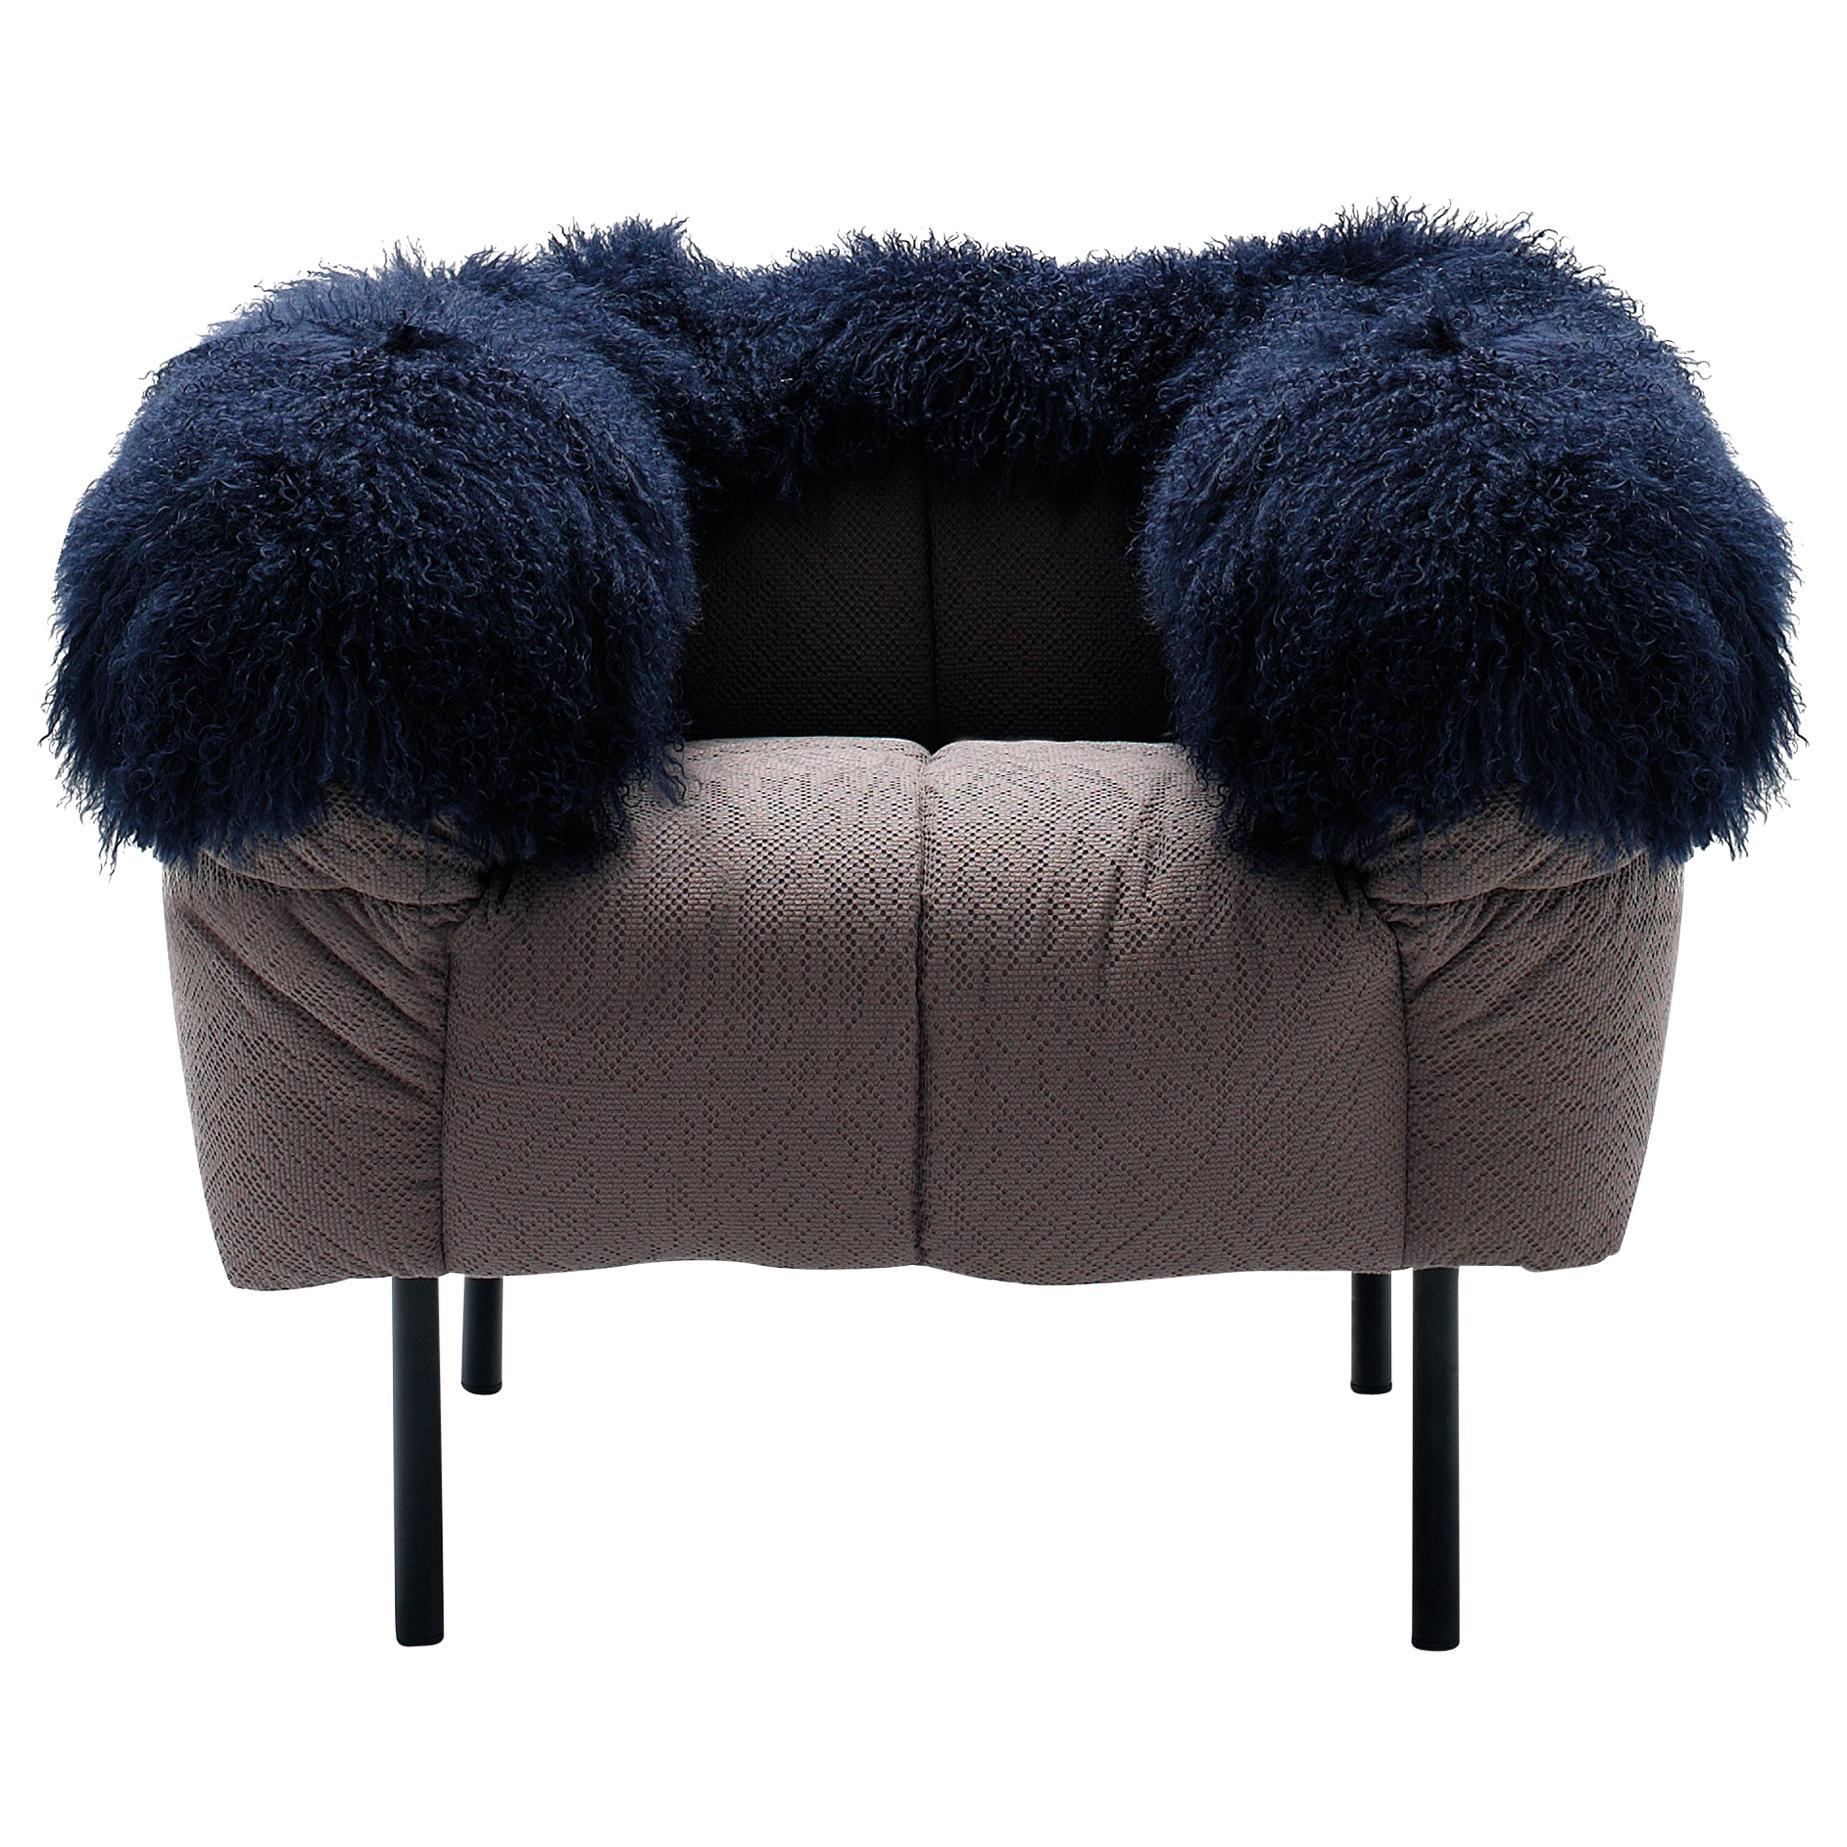 Arflex Pecorelle Armchair in Denver Fabric and Black Fur Corners by Cini Boeri